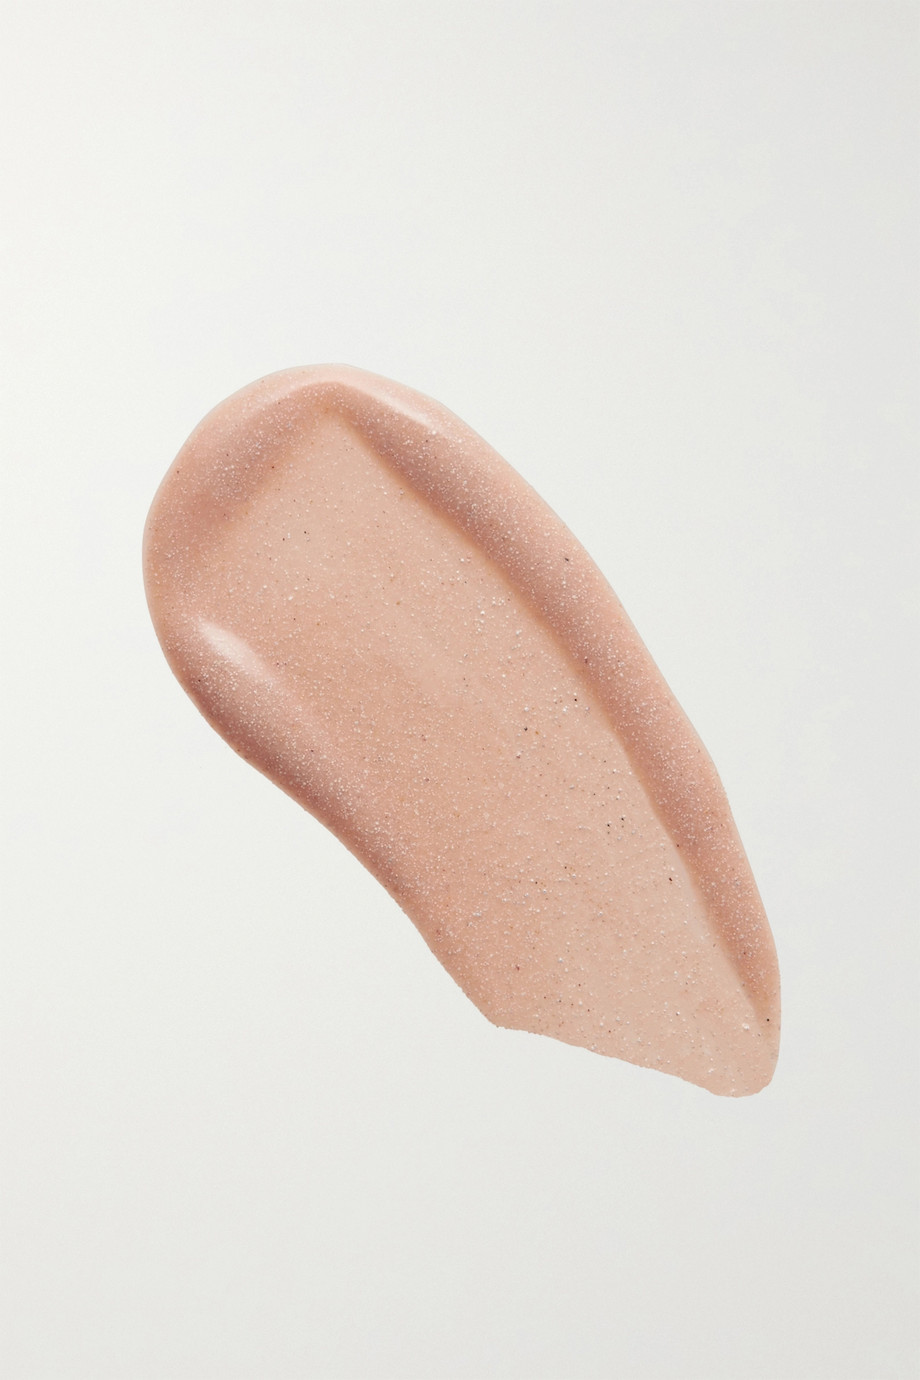 Charlotte Tilbury Unisex Healthy Glow Tinted Moisturizer, 40ml